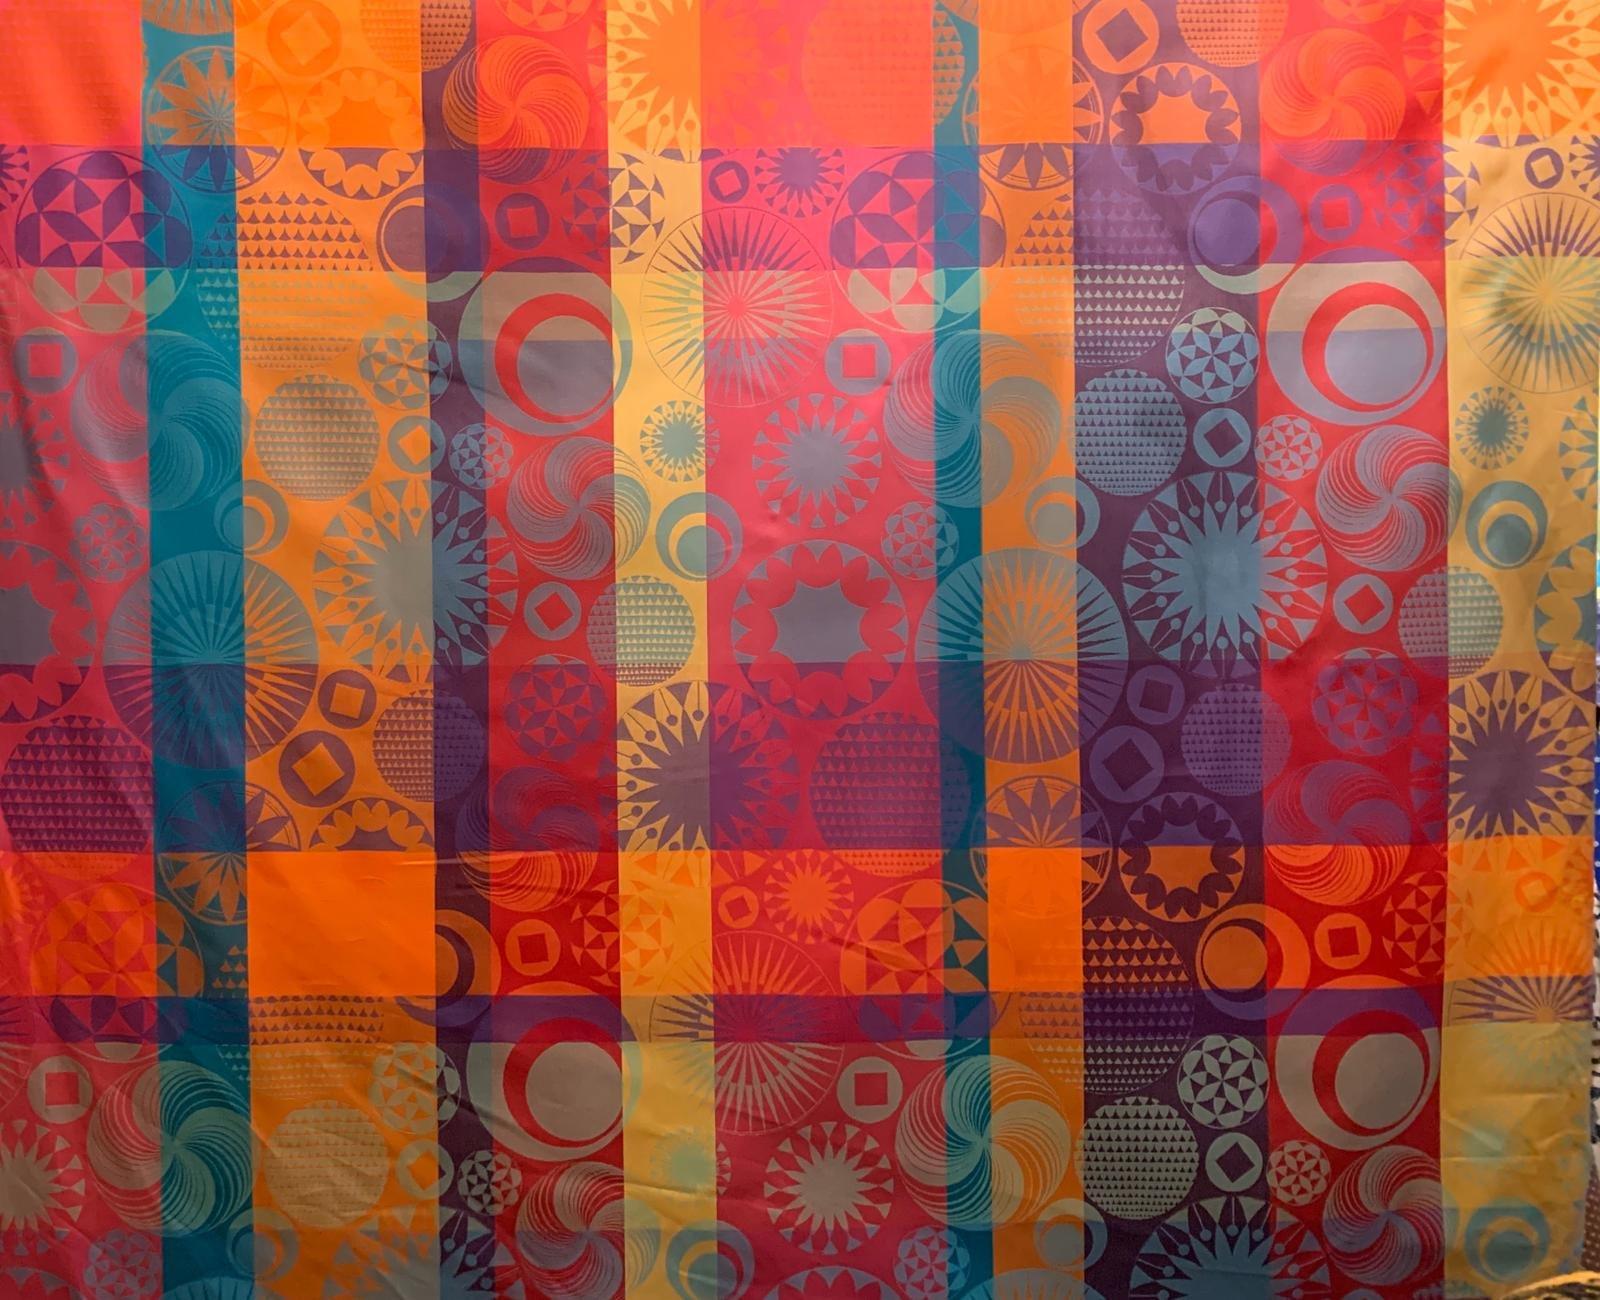 Garnier-Thiebaut Multicolored Festival Treated Fabric